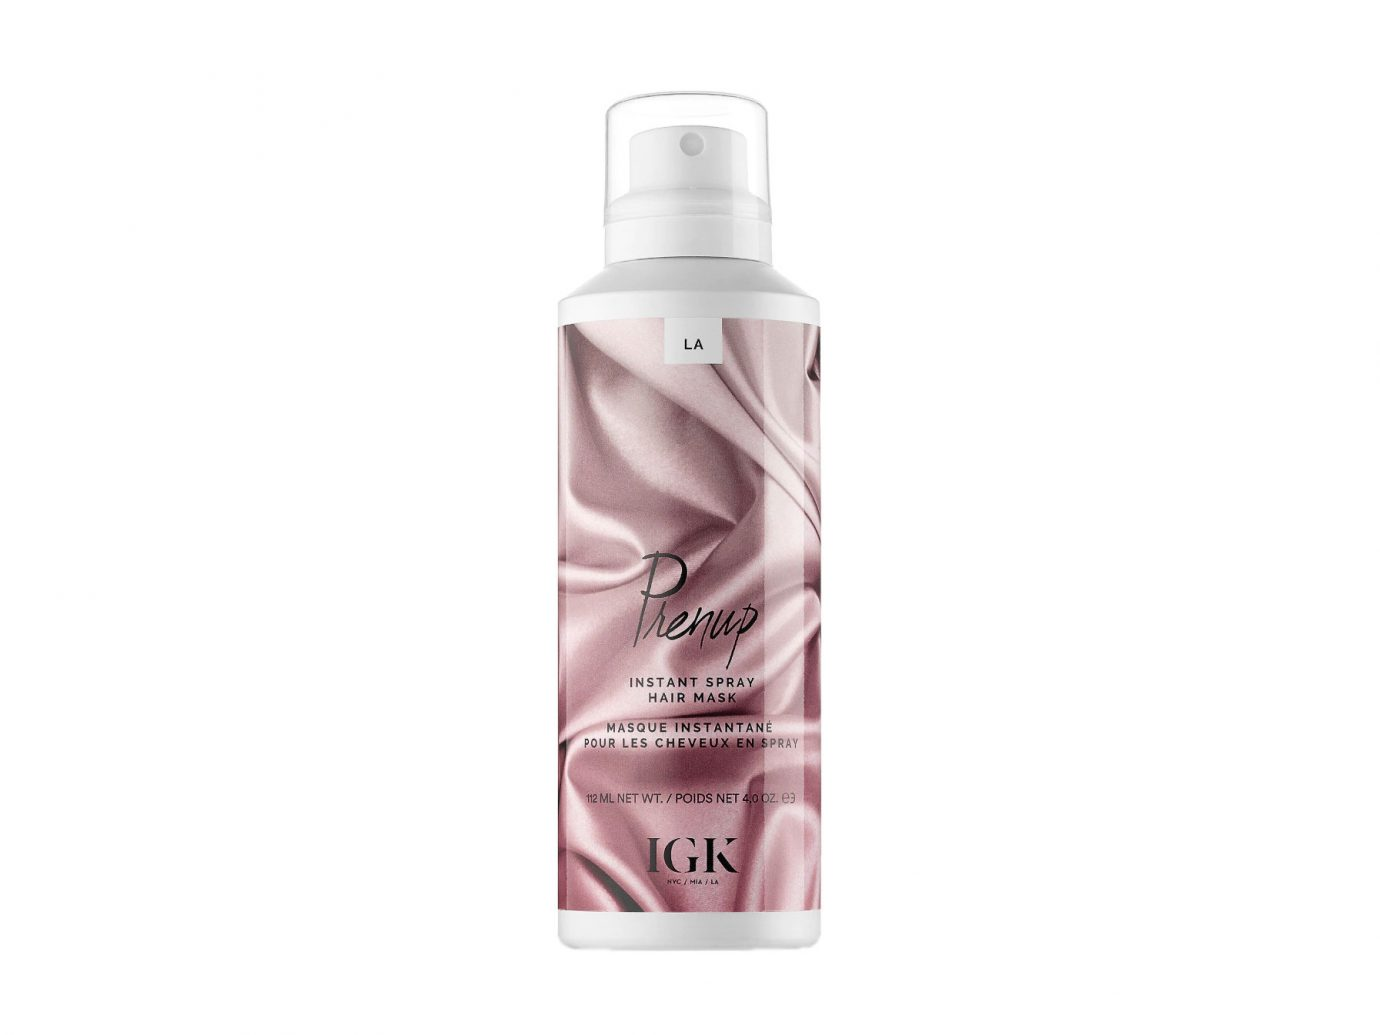 IGK Prenup Instant Spray Hair Mask